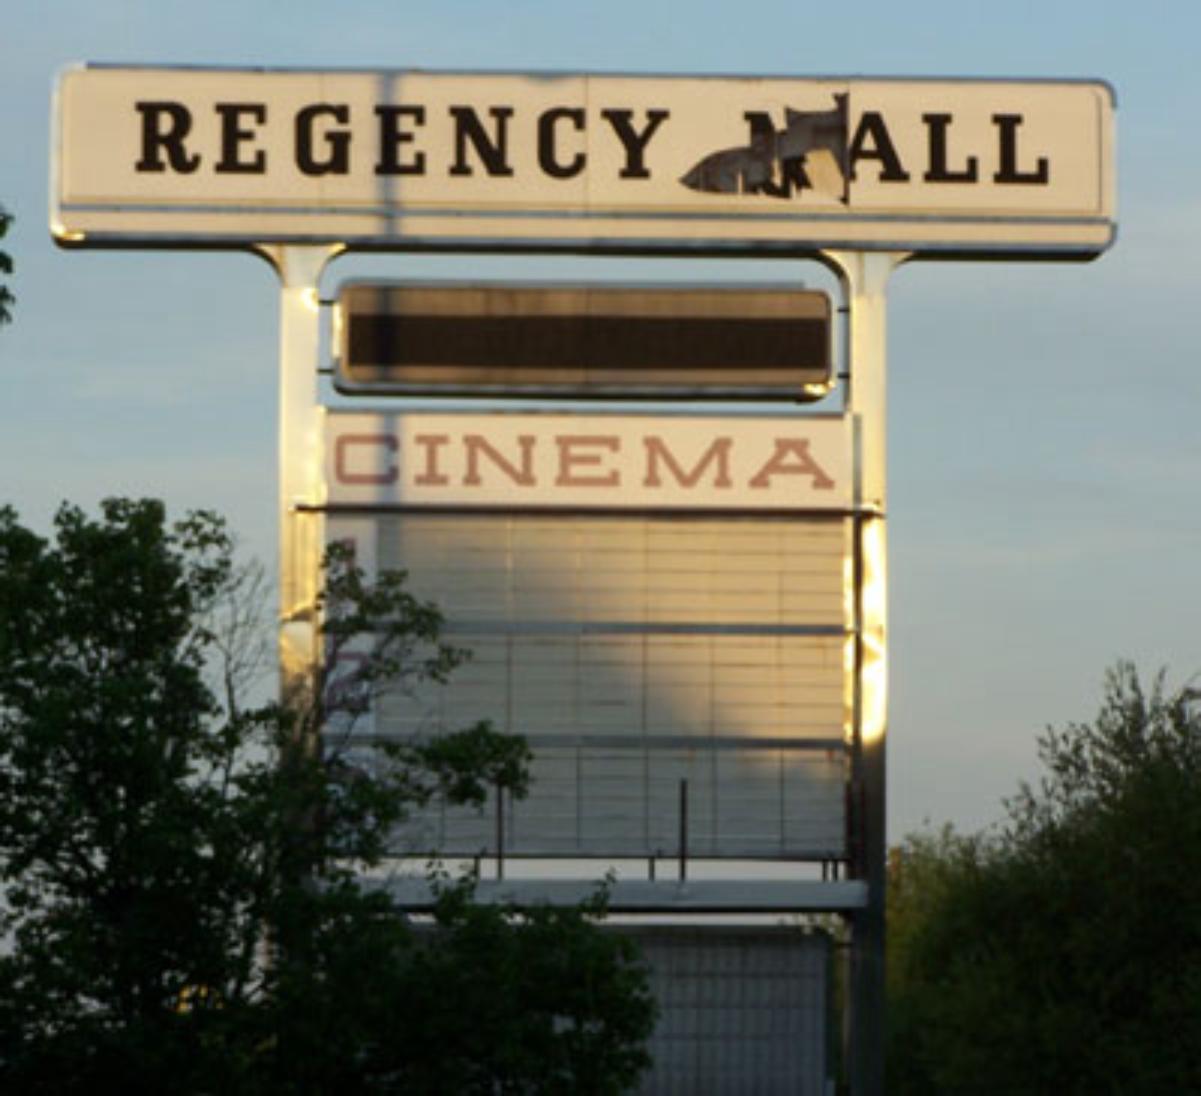 Regency Mall (Augusta, Georgia)